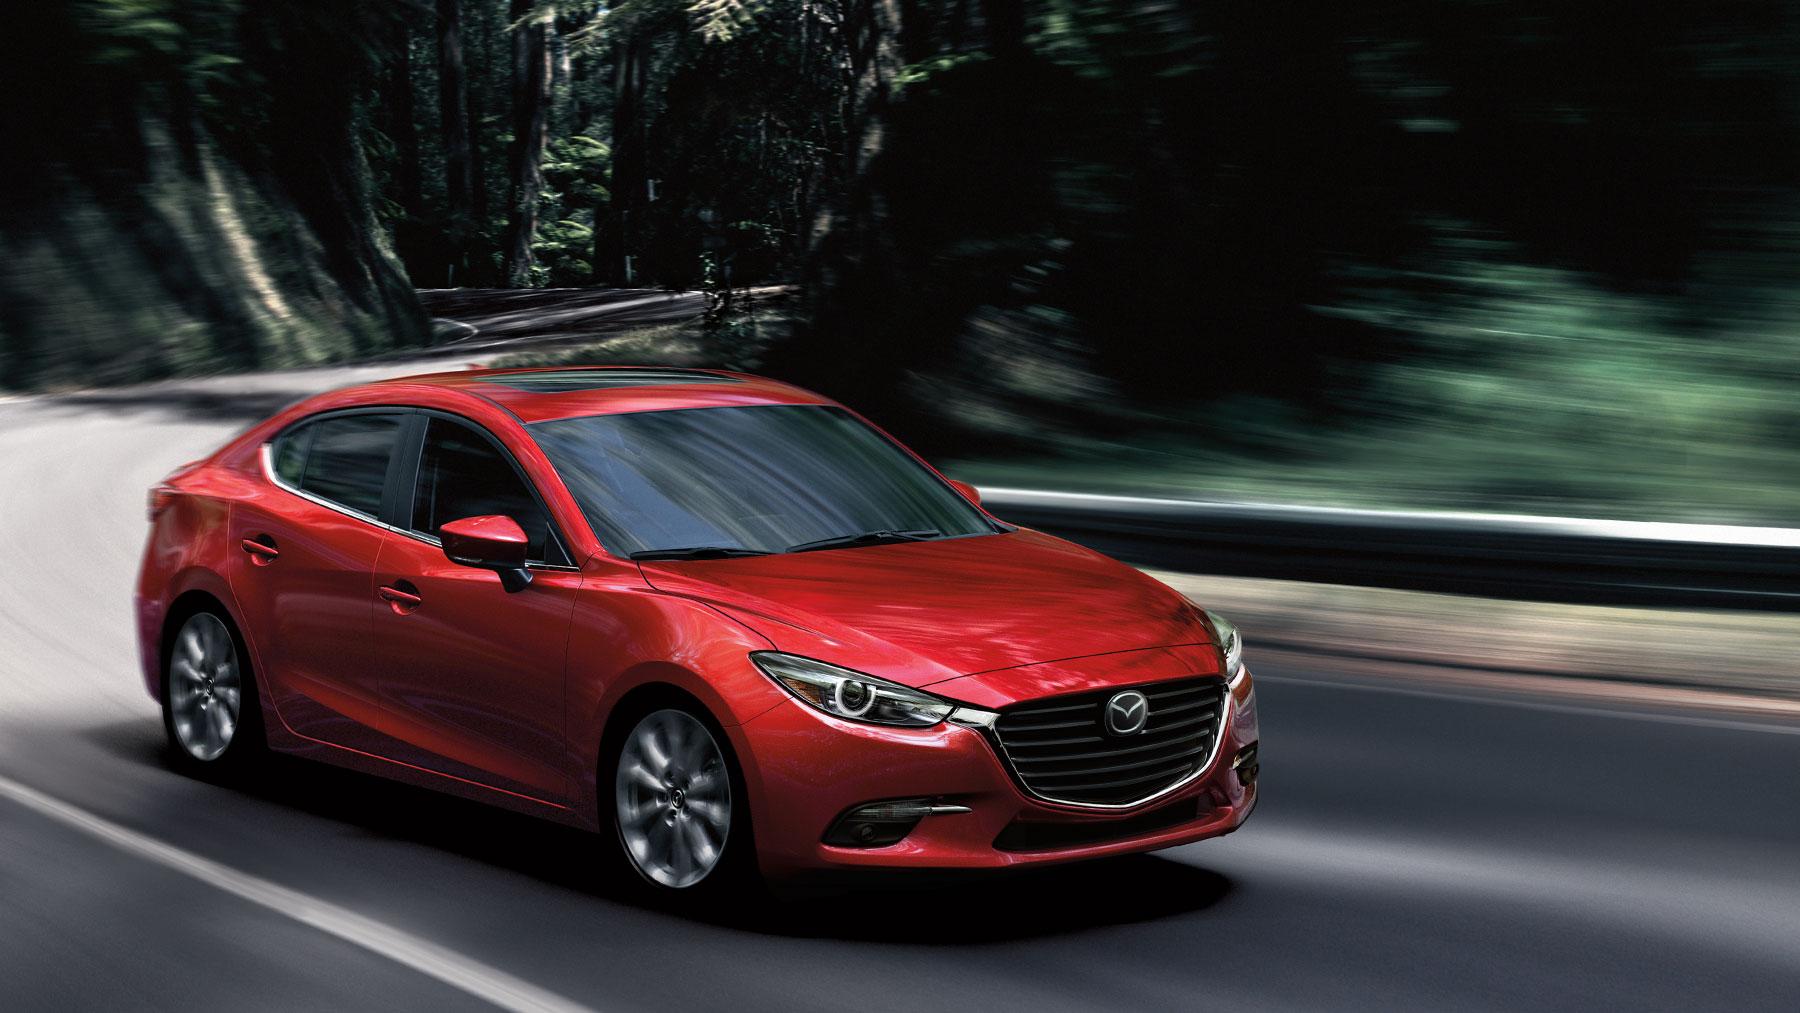 Mazda Usa Financing Sedan Pictures Videos Mazda Usa